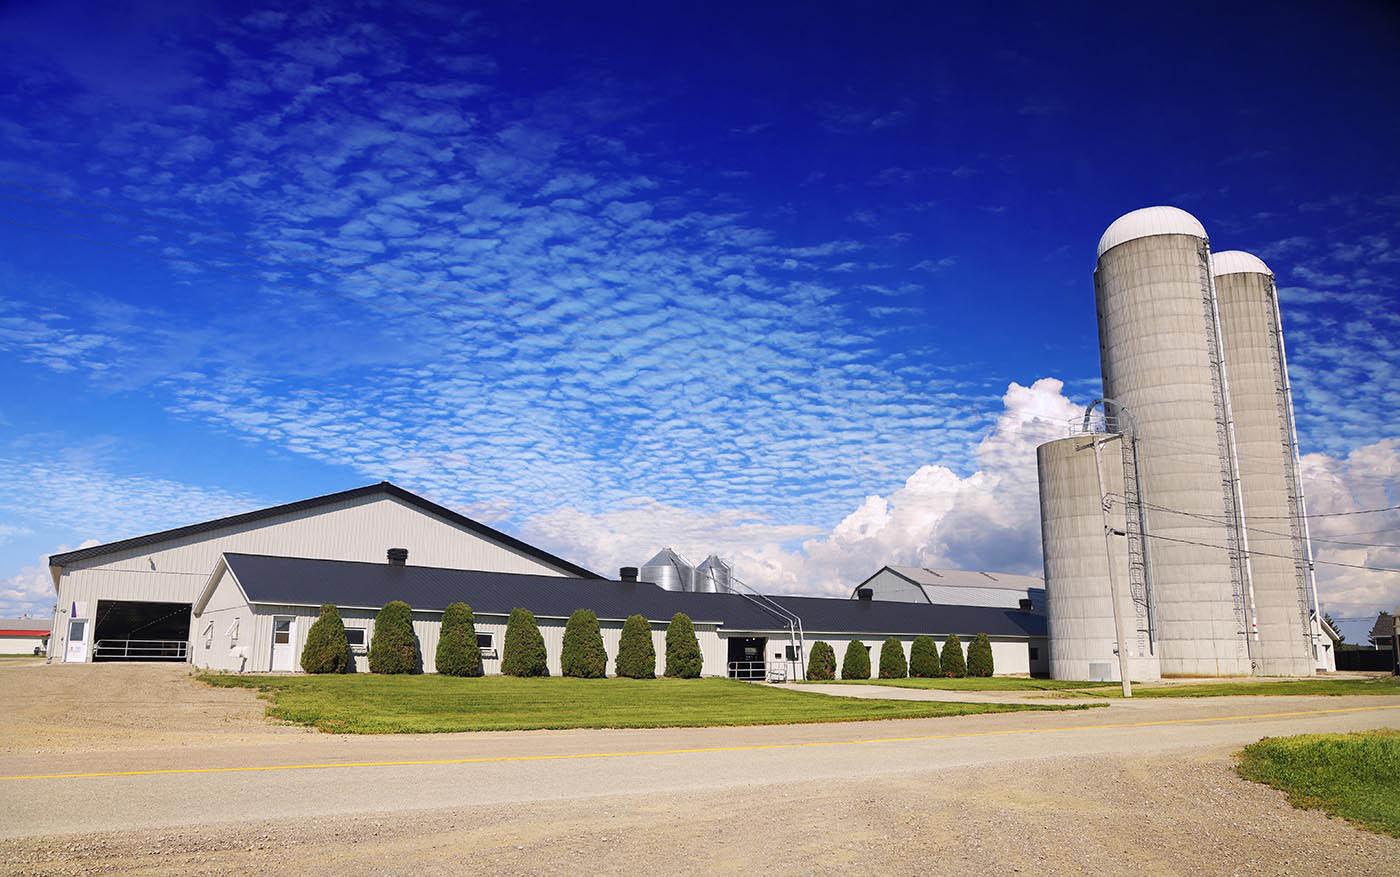 Modern Large Farm with Bulk Grain Storage Silos